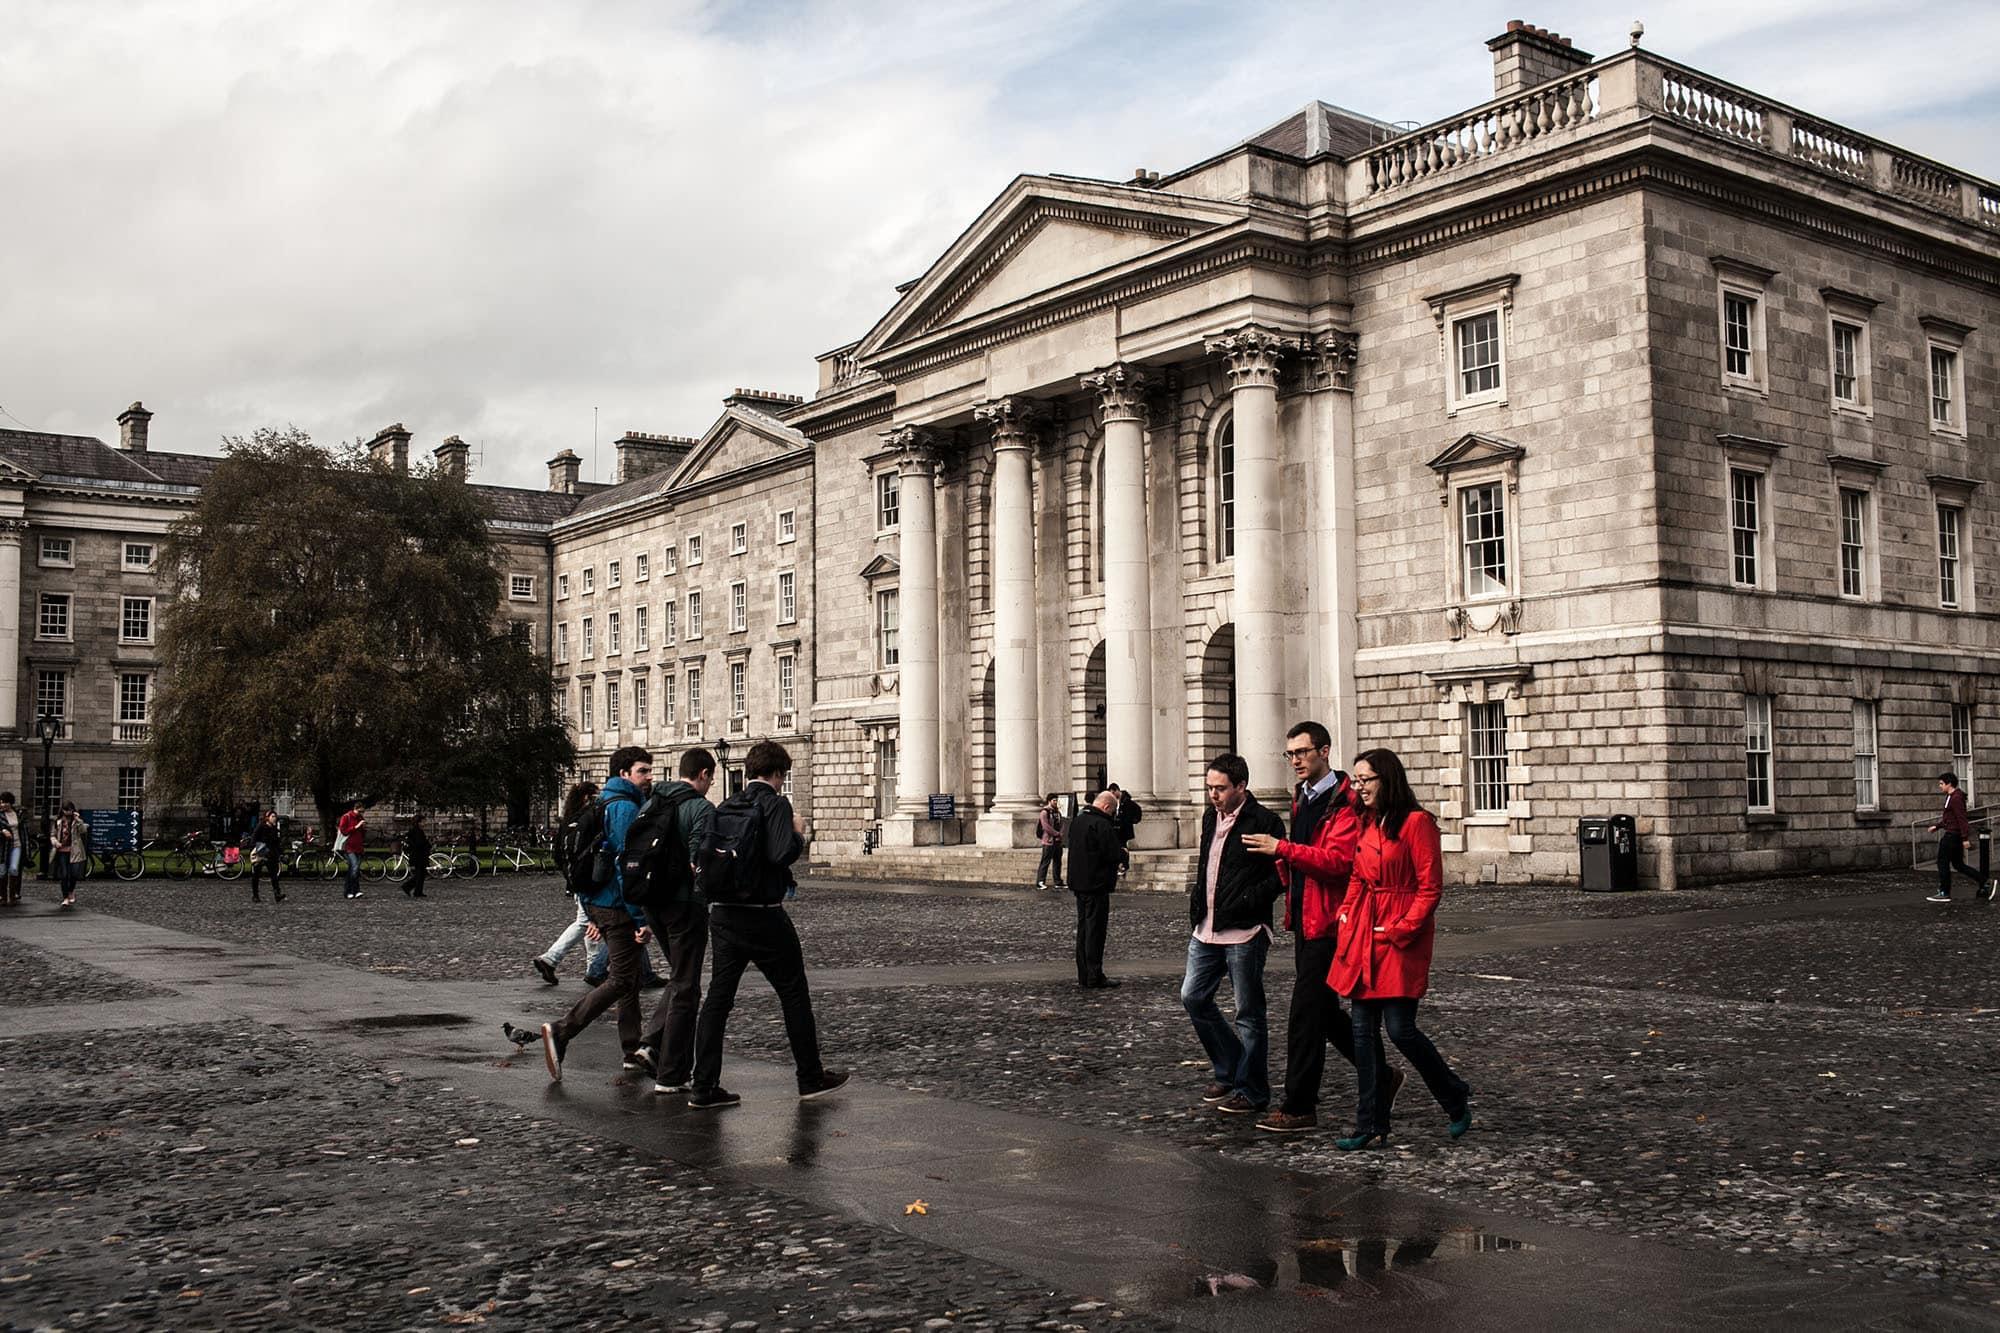 TBEX photo tour in Dublin, Ireland